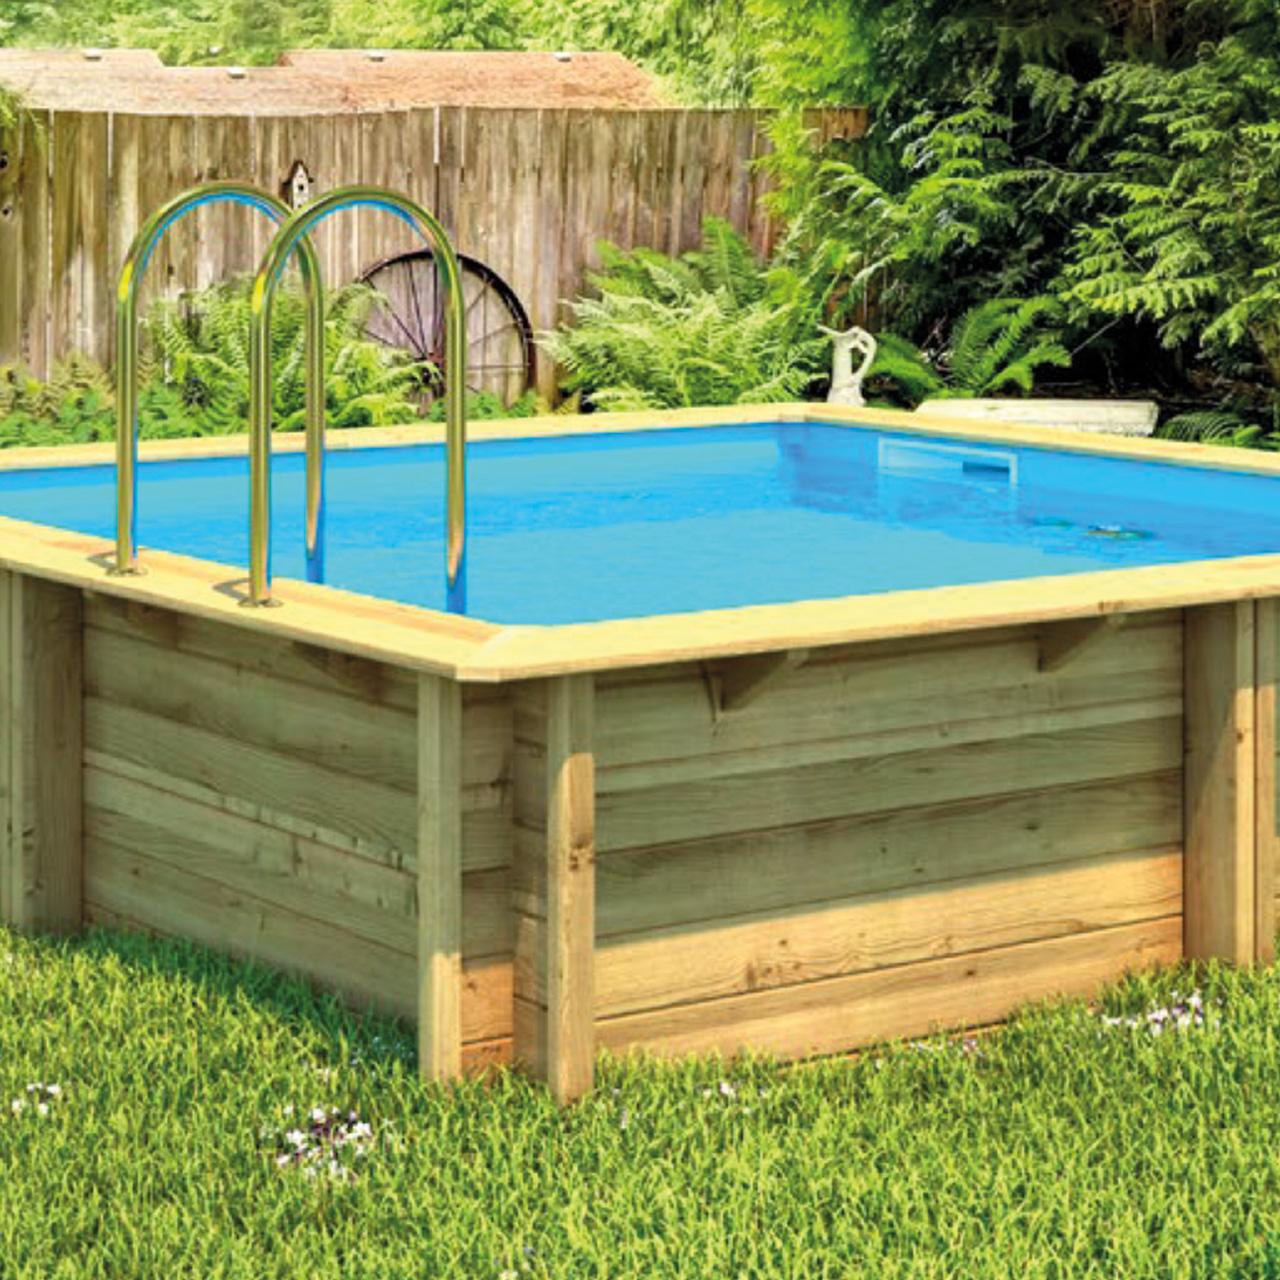 Gfk Pool Teilversenkt Weva Holzbecken Fkb Schwimmbadtechnik